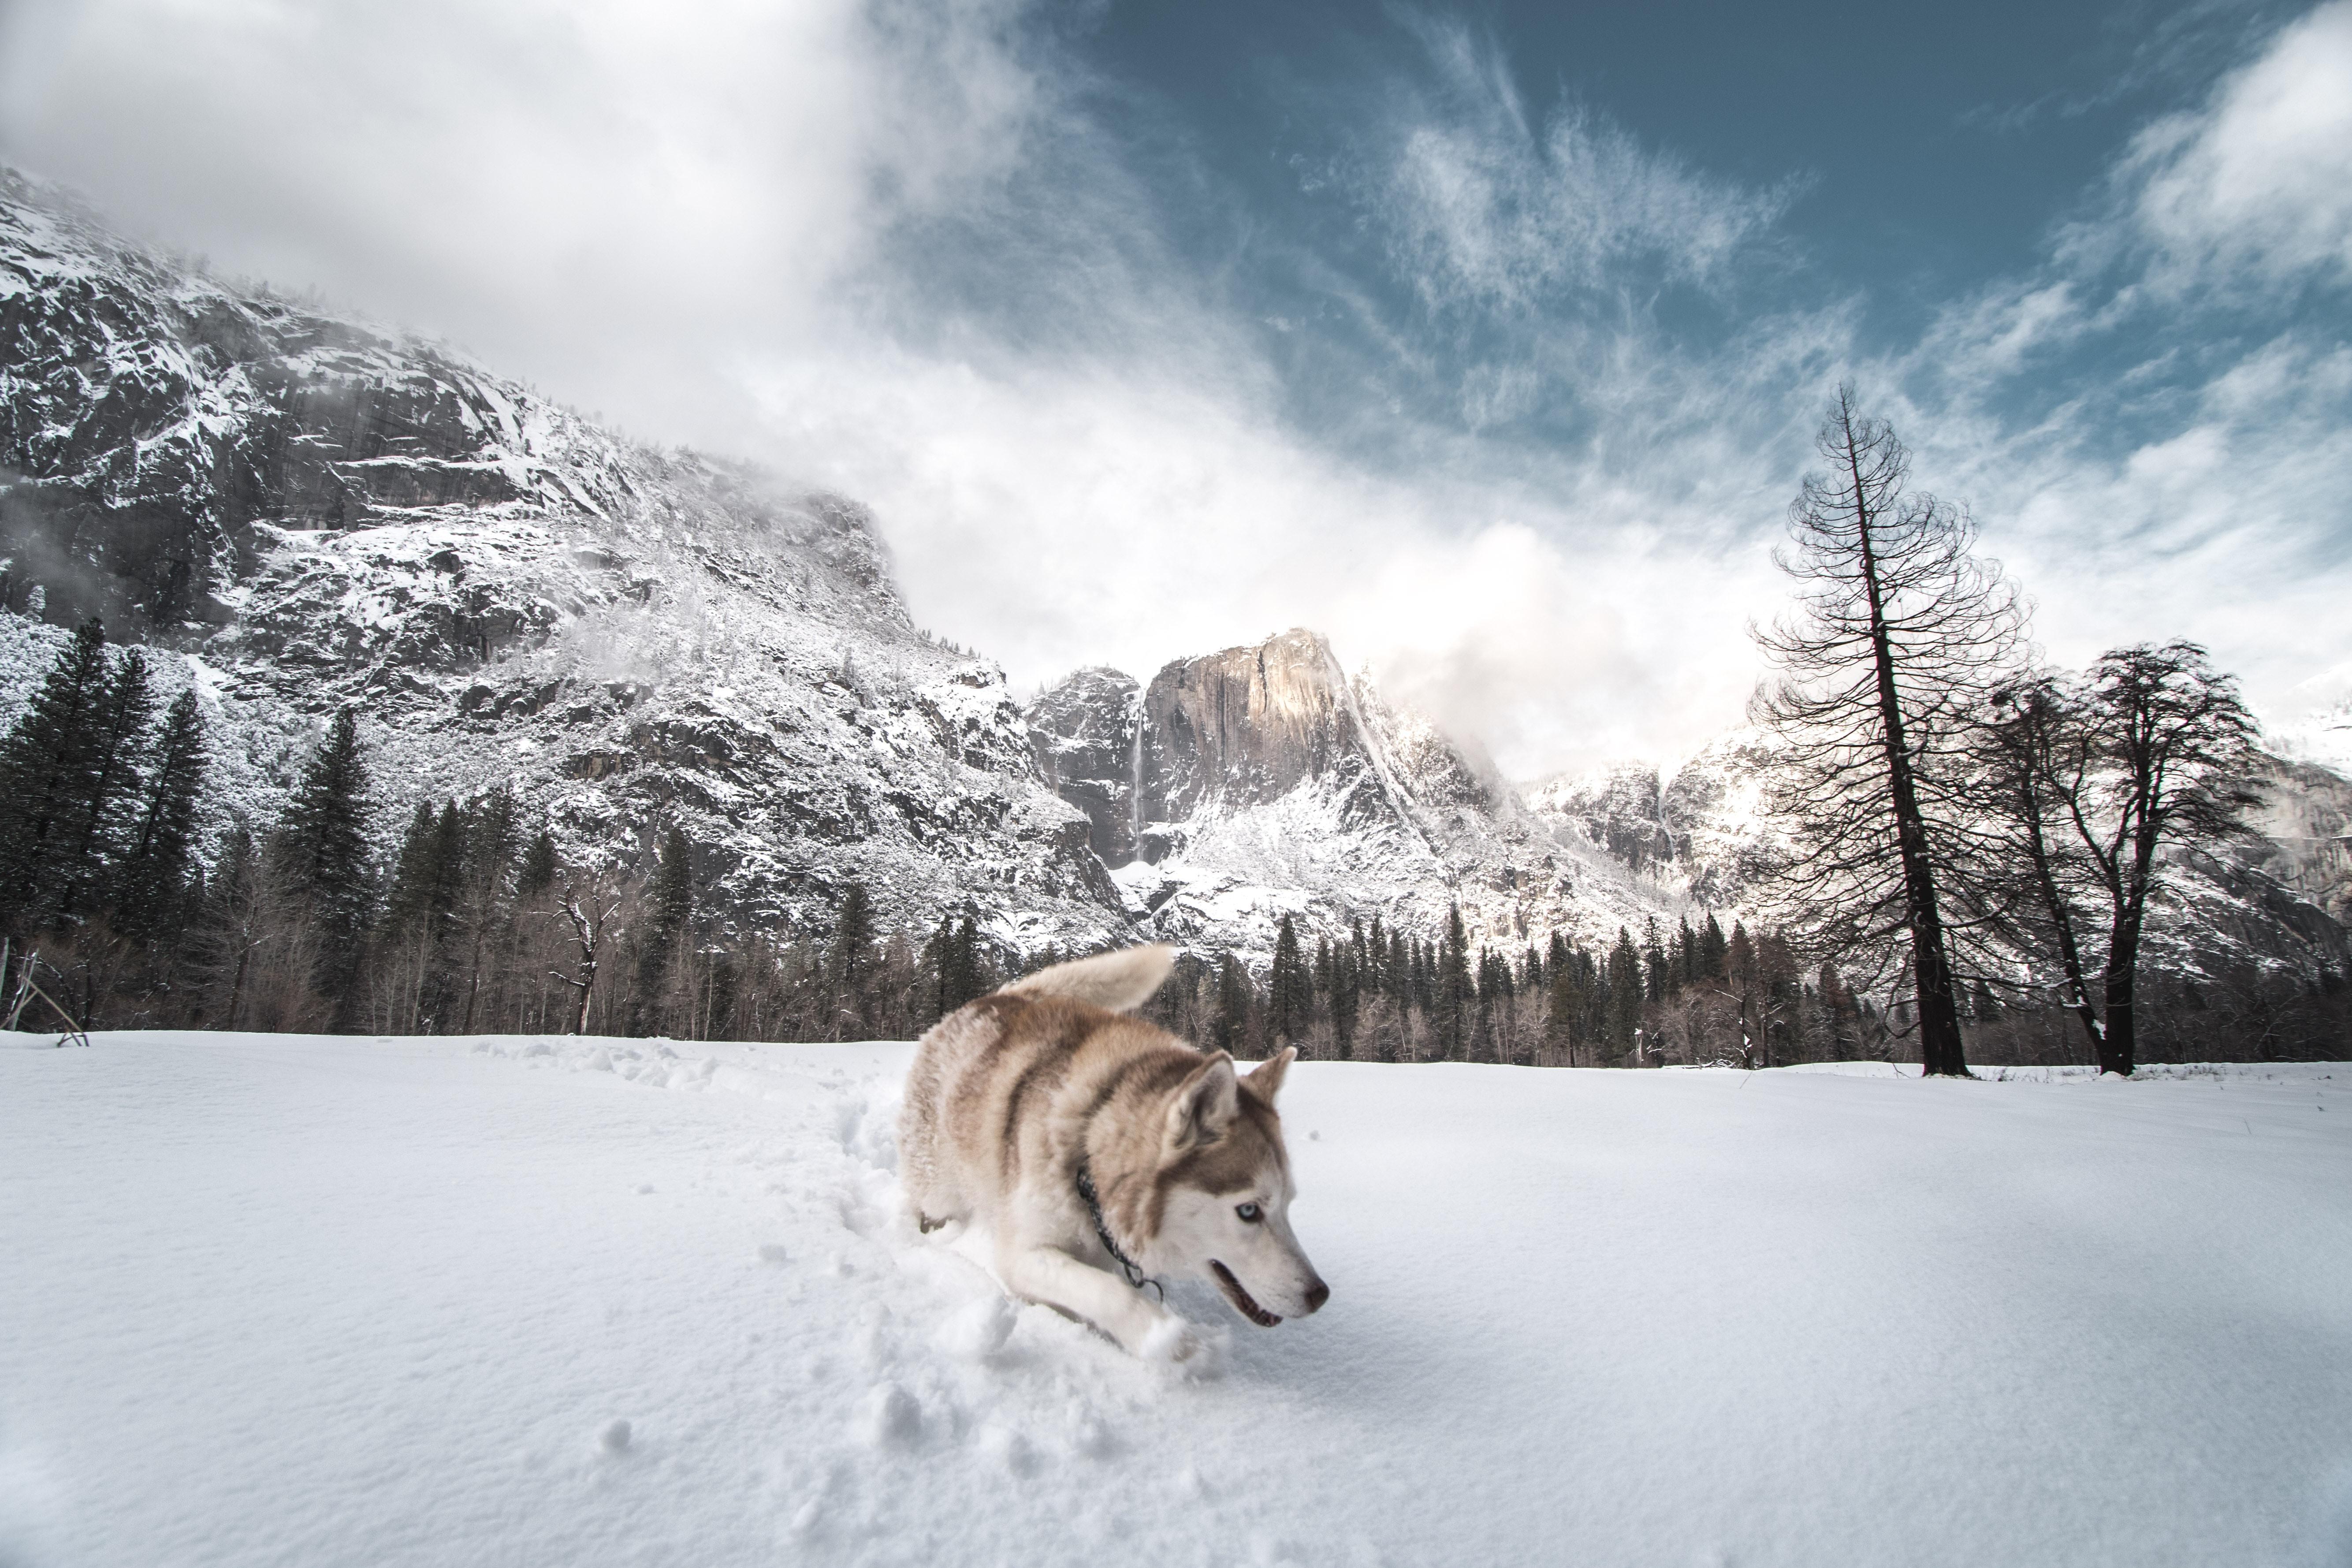 siberian husky in snow 1574938025 - Siberian Husky In Snow -